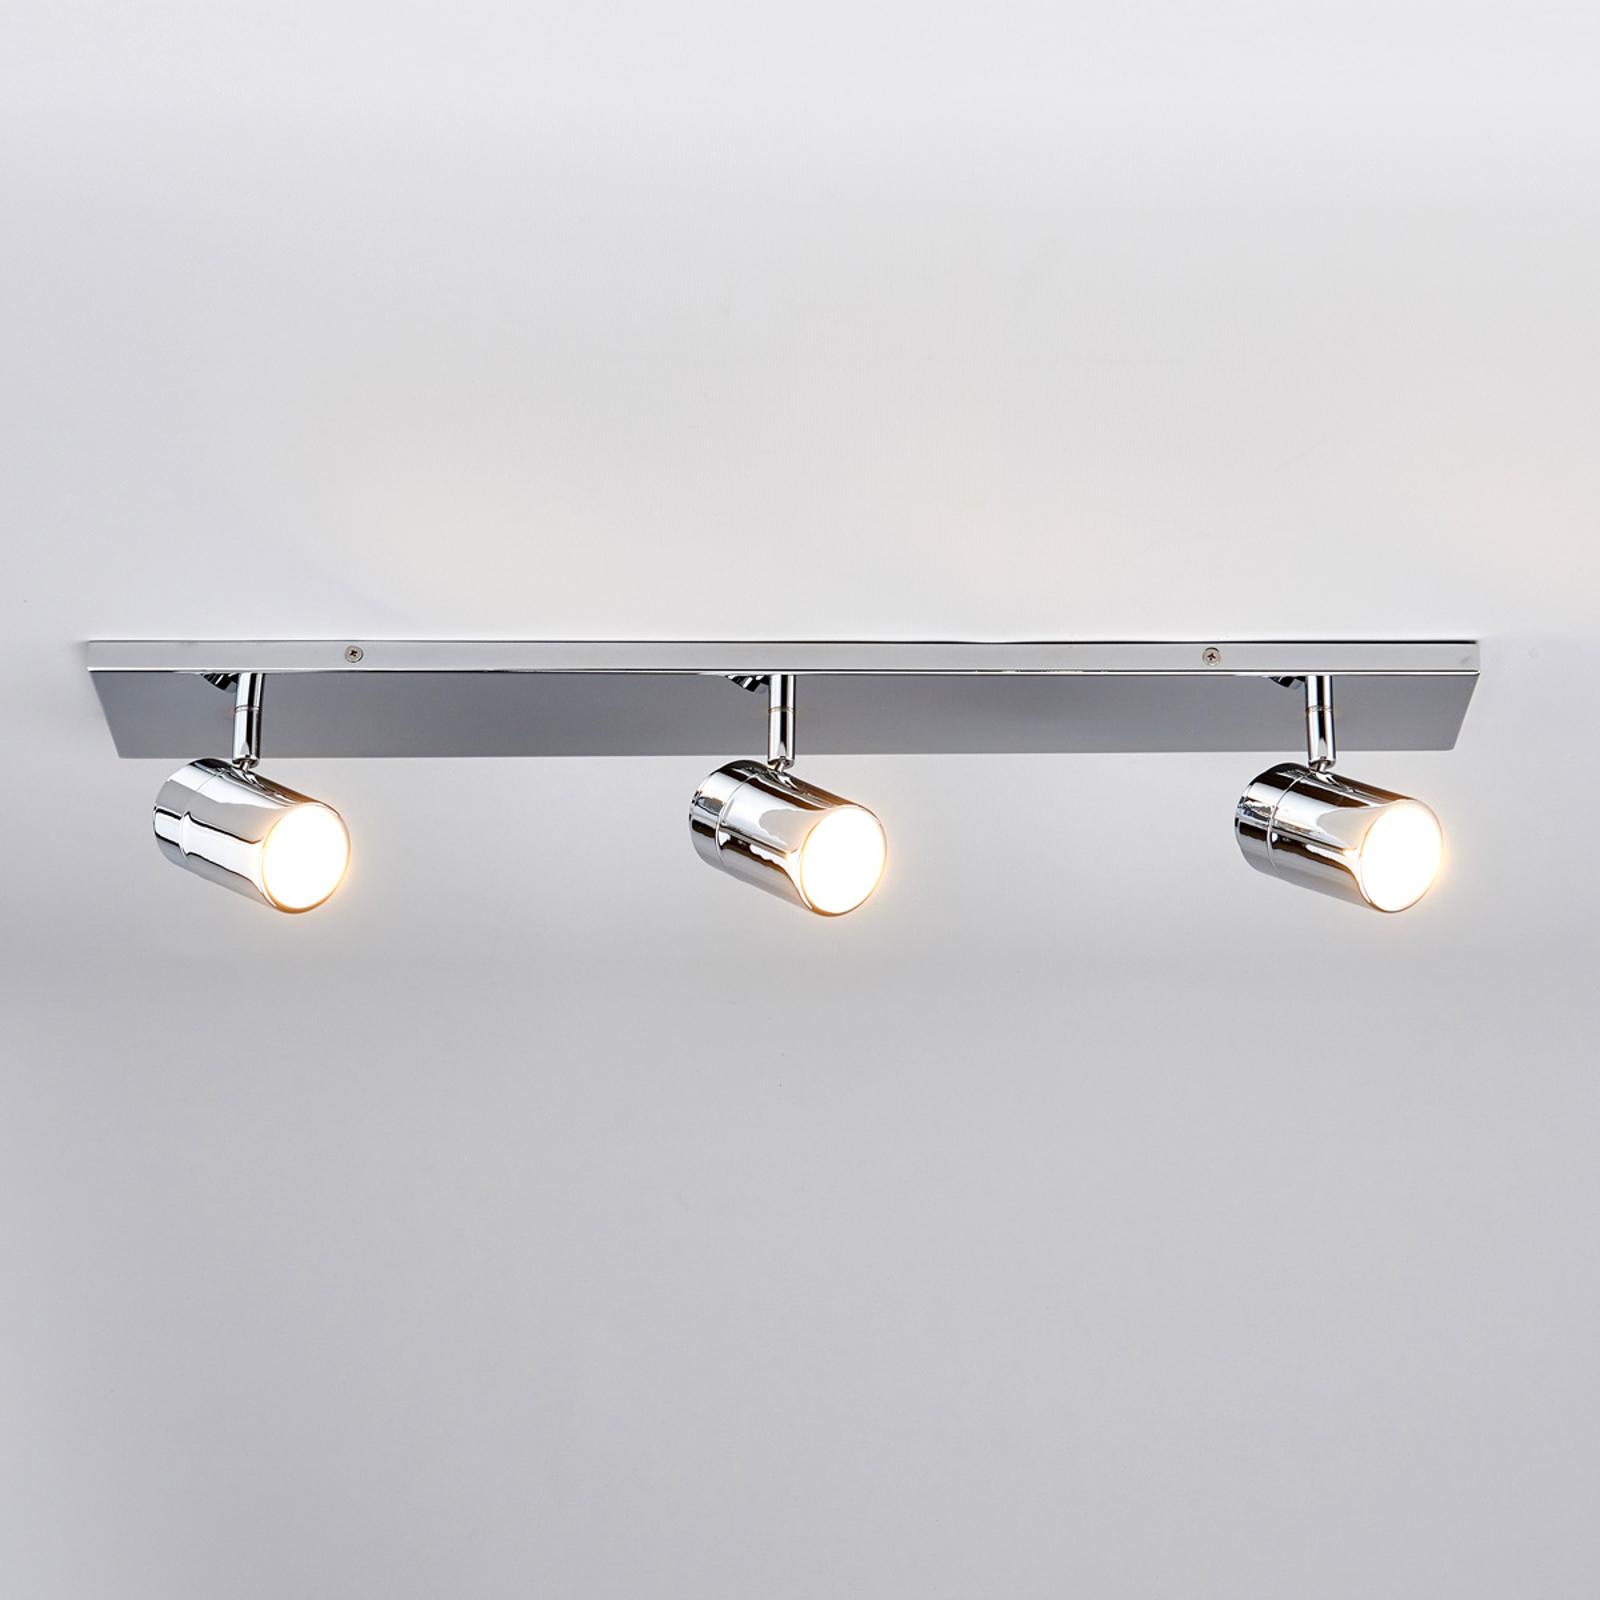 Dejan - loftslampe til badet med 3 lyskilder